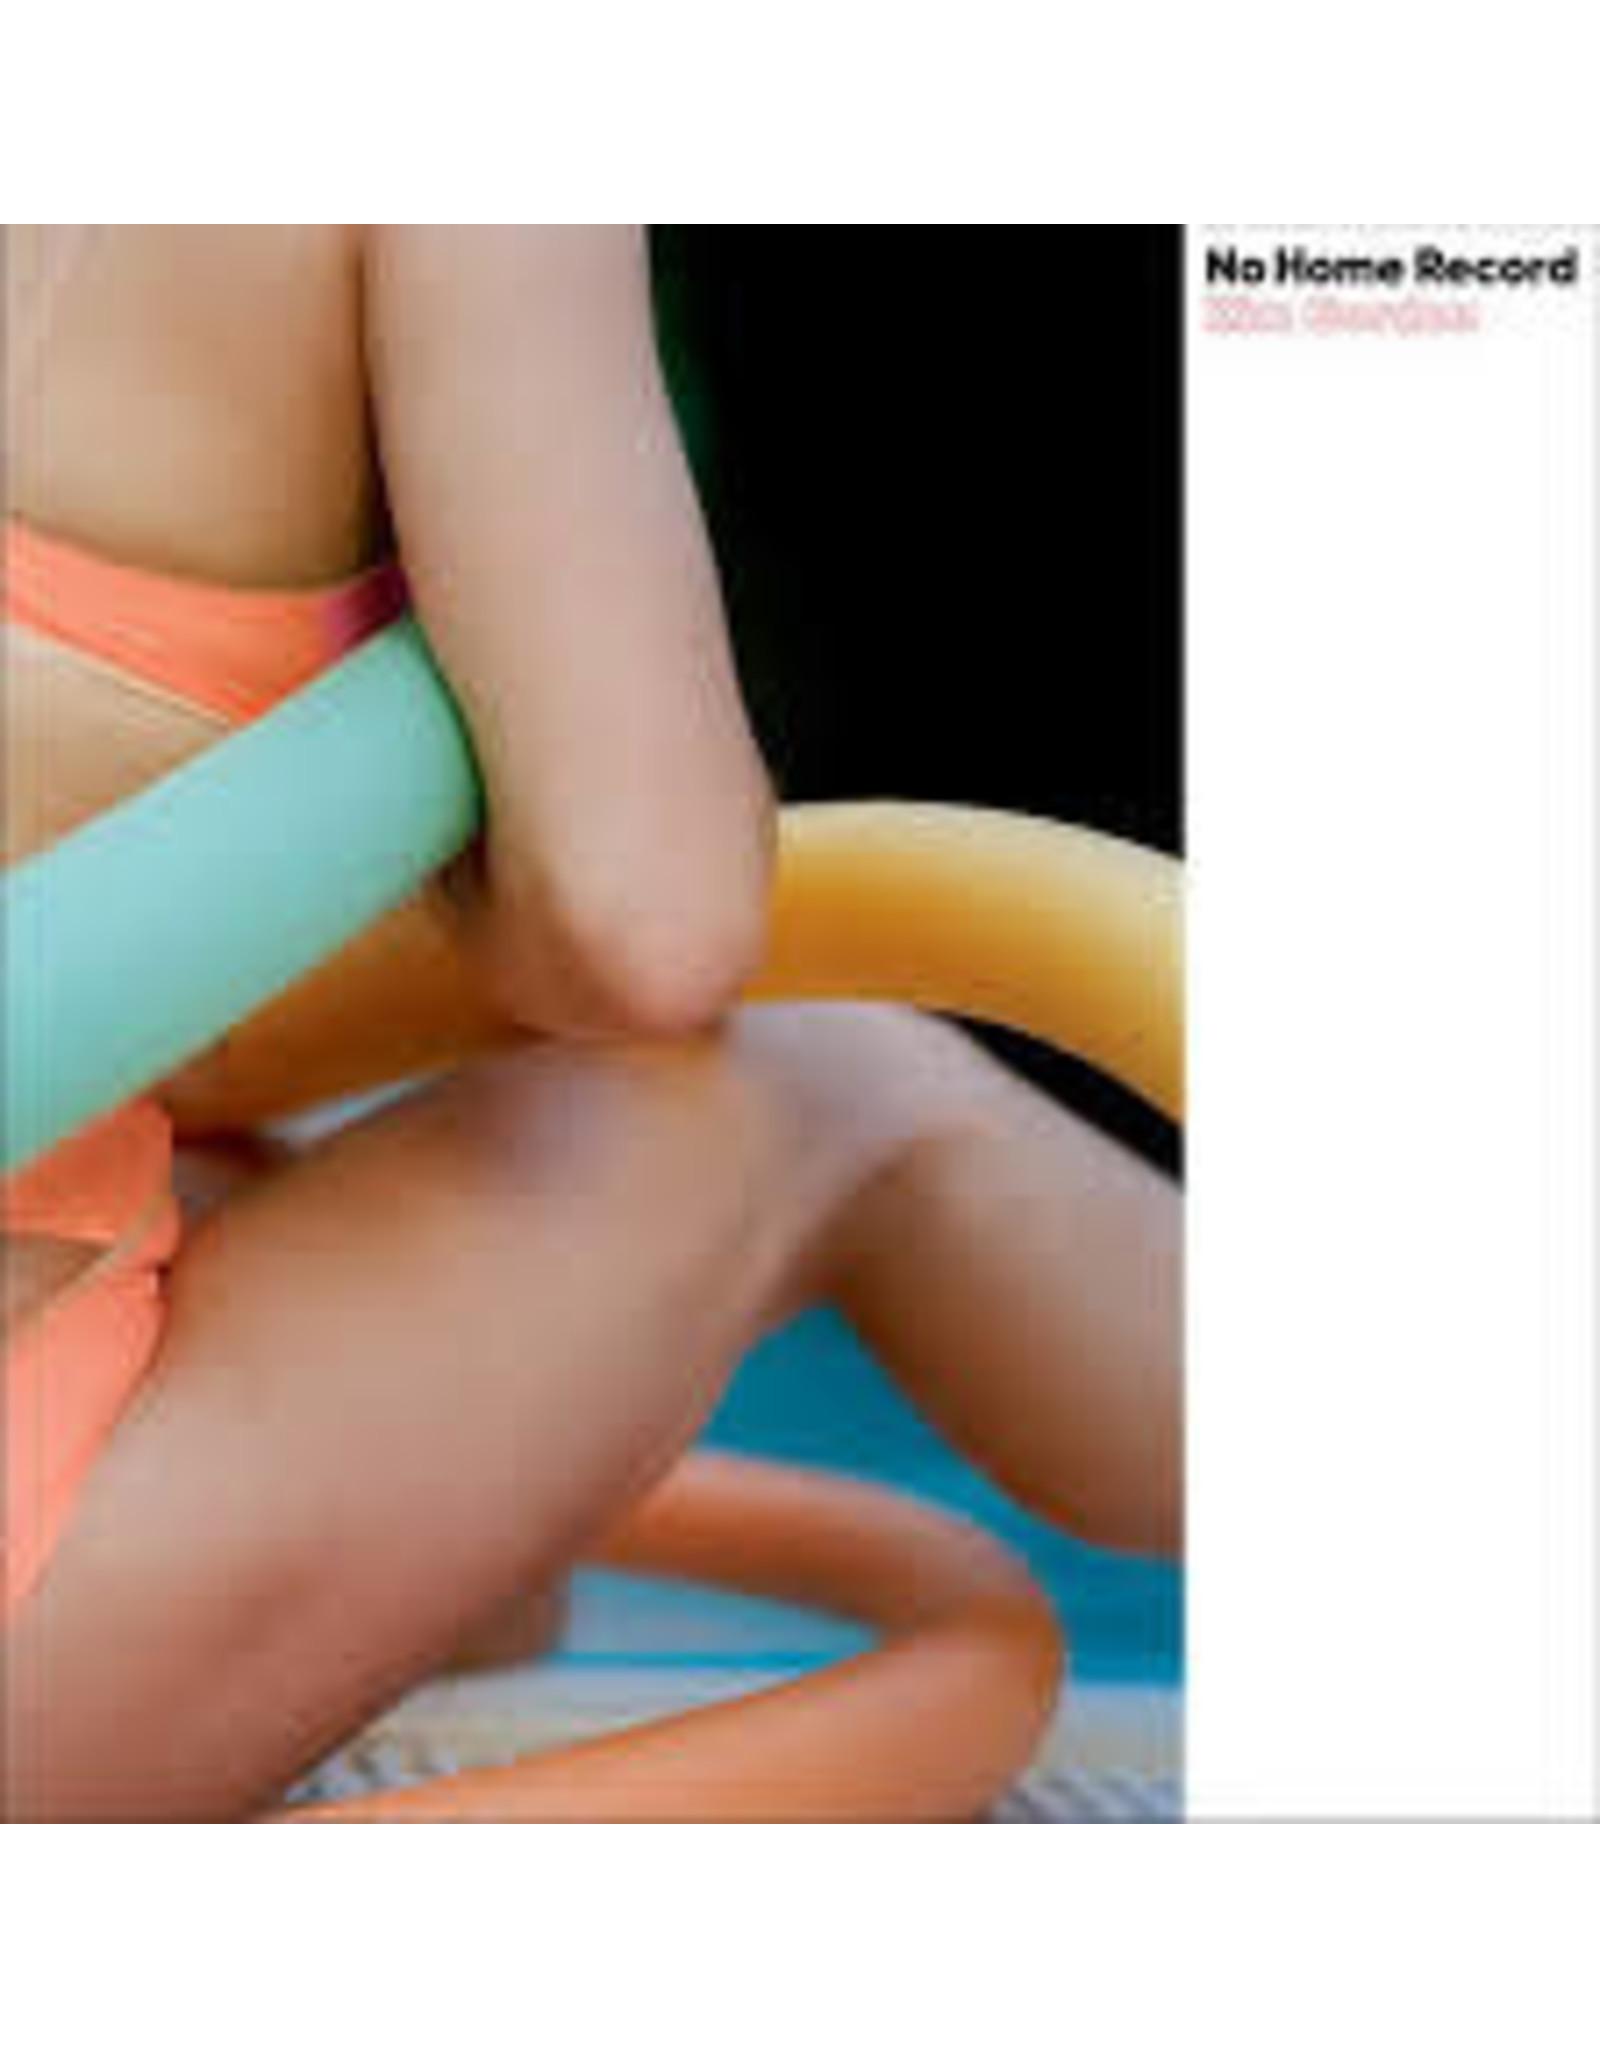 Gordon, Kim - No Home Record CD